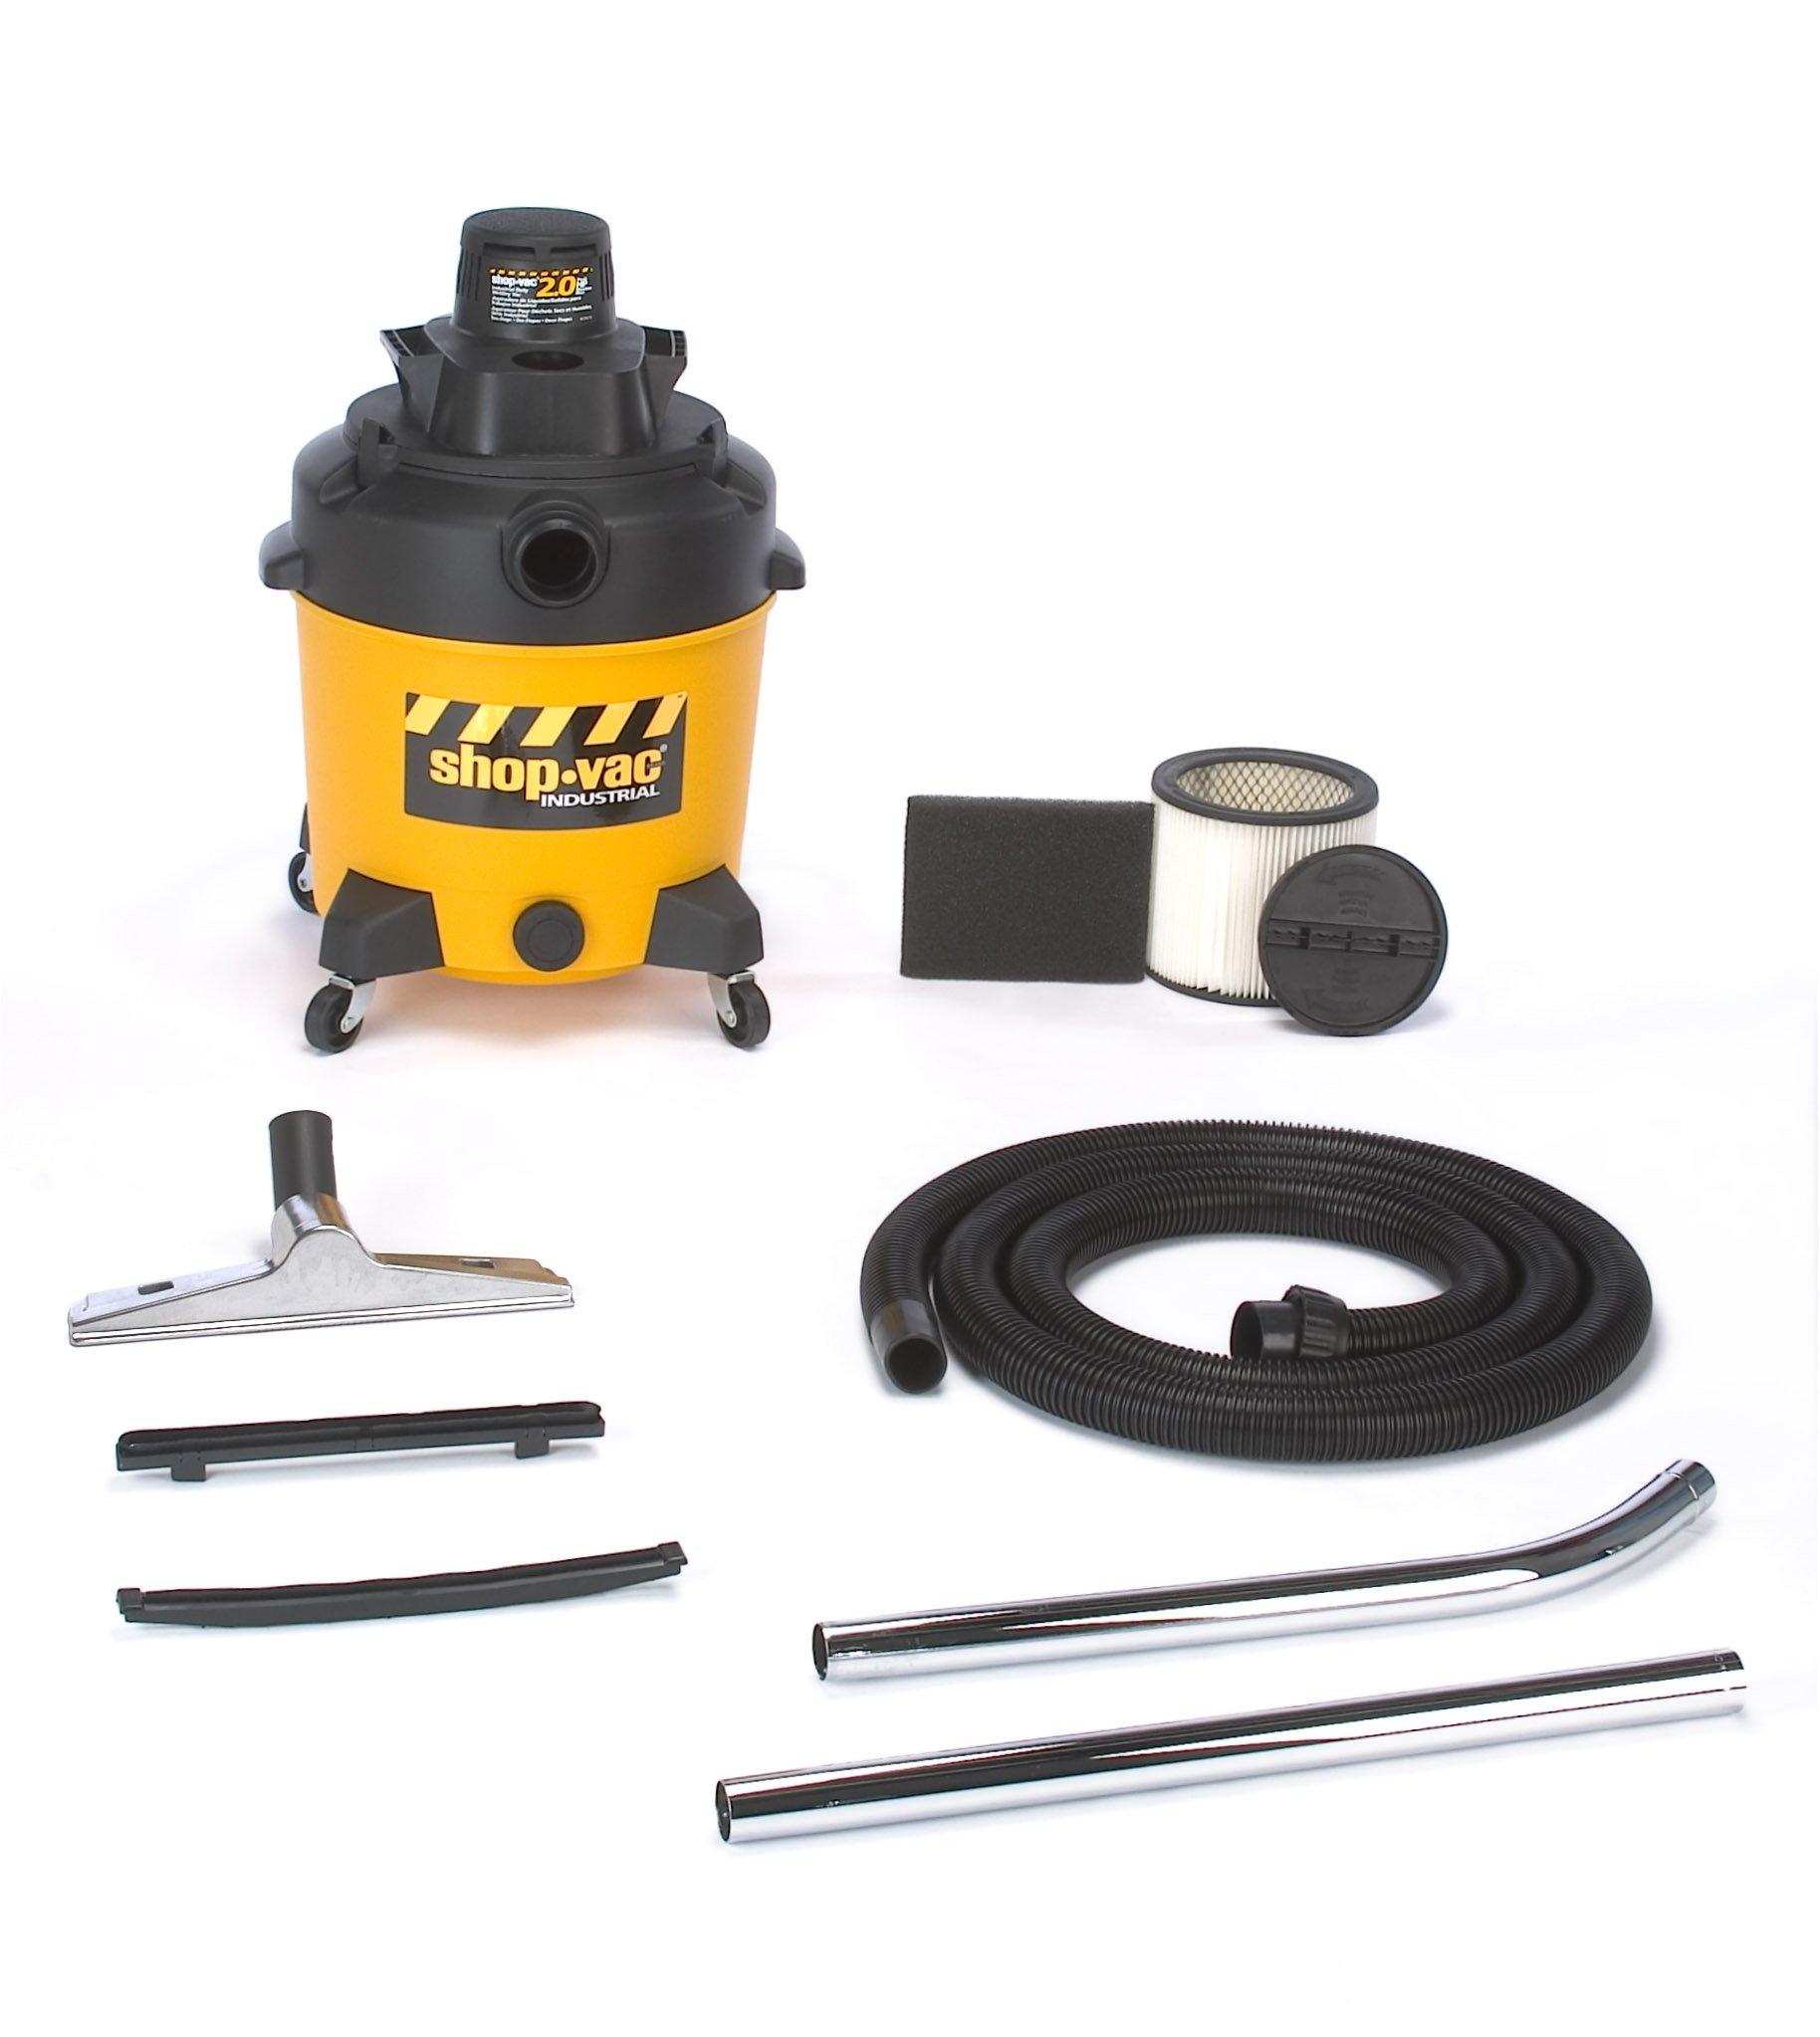 Shop-Vac 6101210 12-Gallon 2-Peak HP 2-Stage Contractor Wet/Dry Vacuum by Shop-Vac (Image #1)